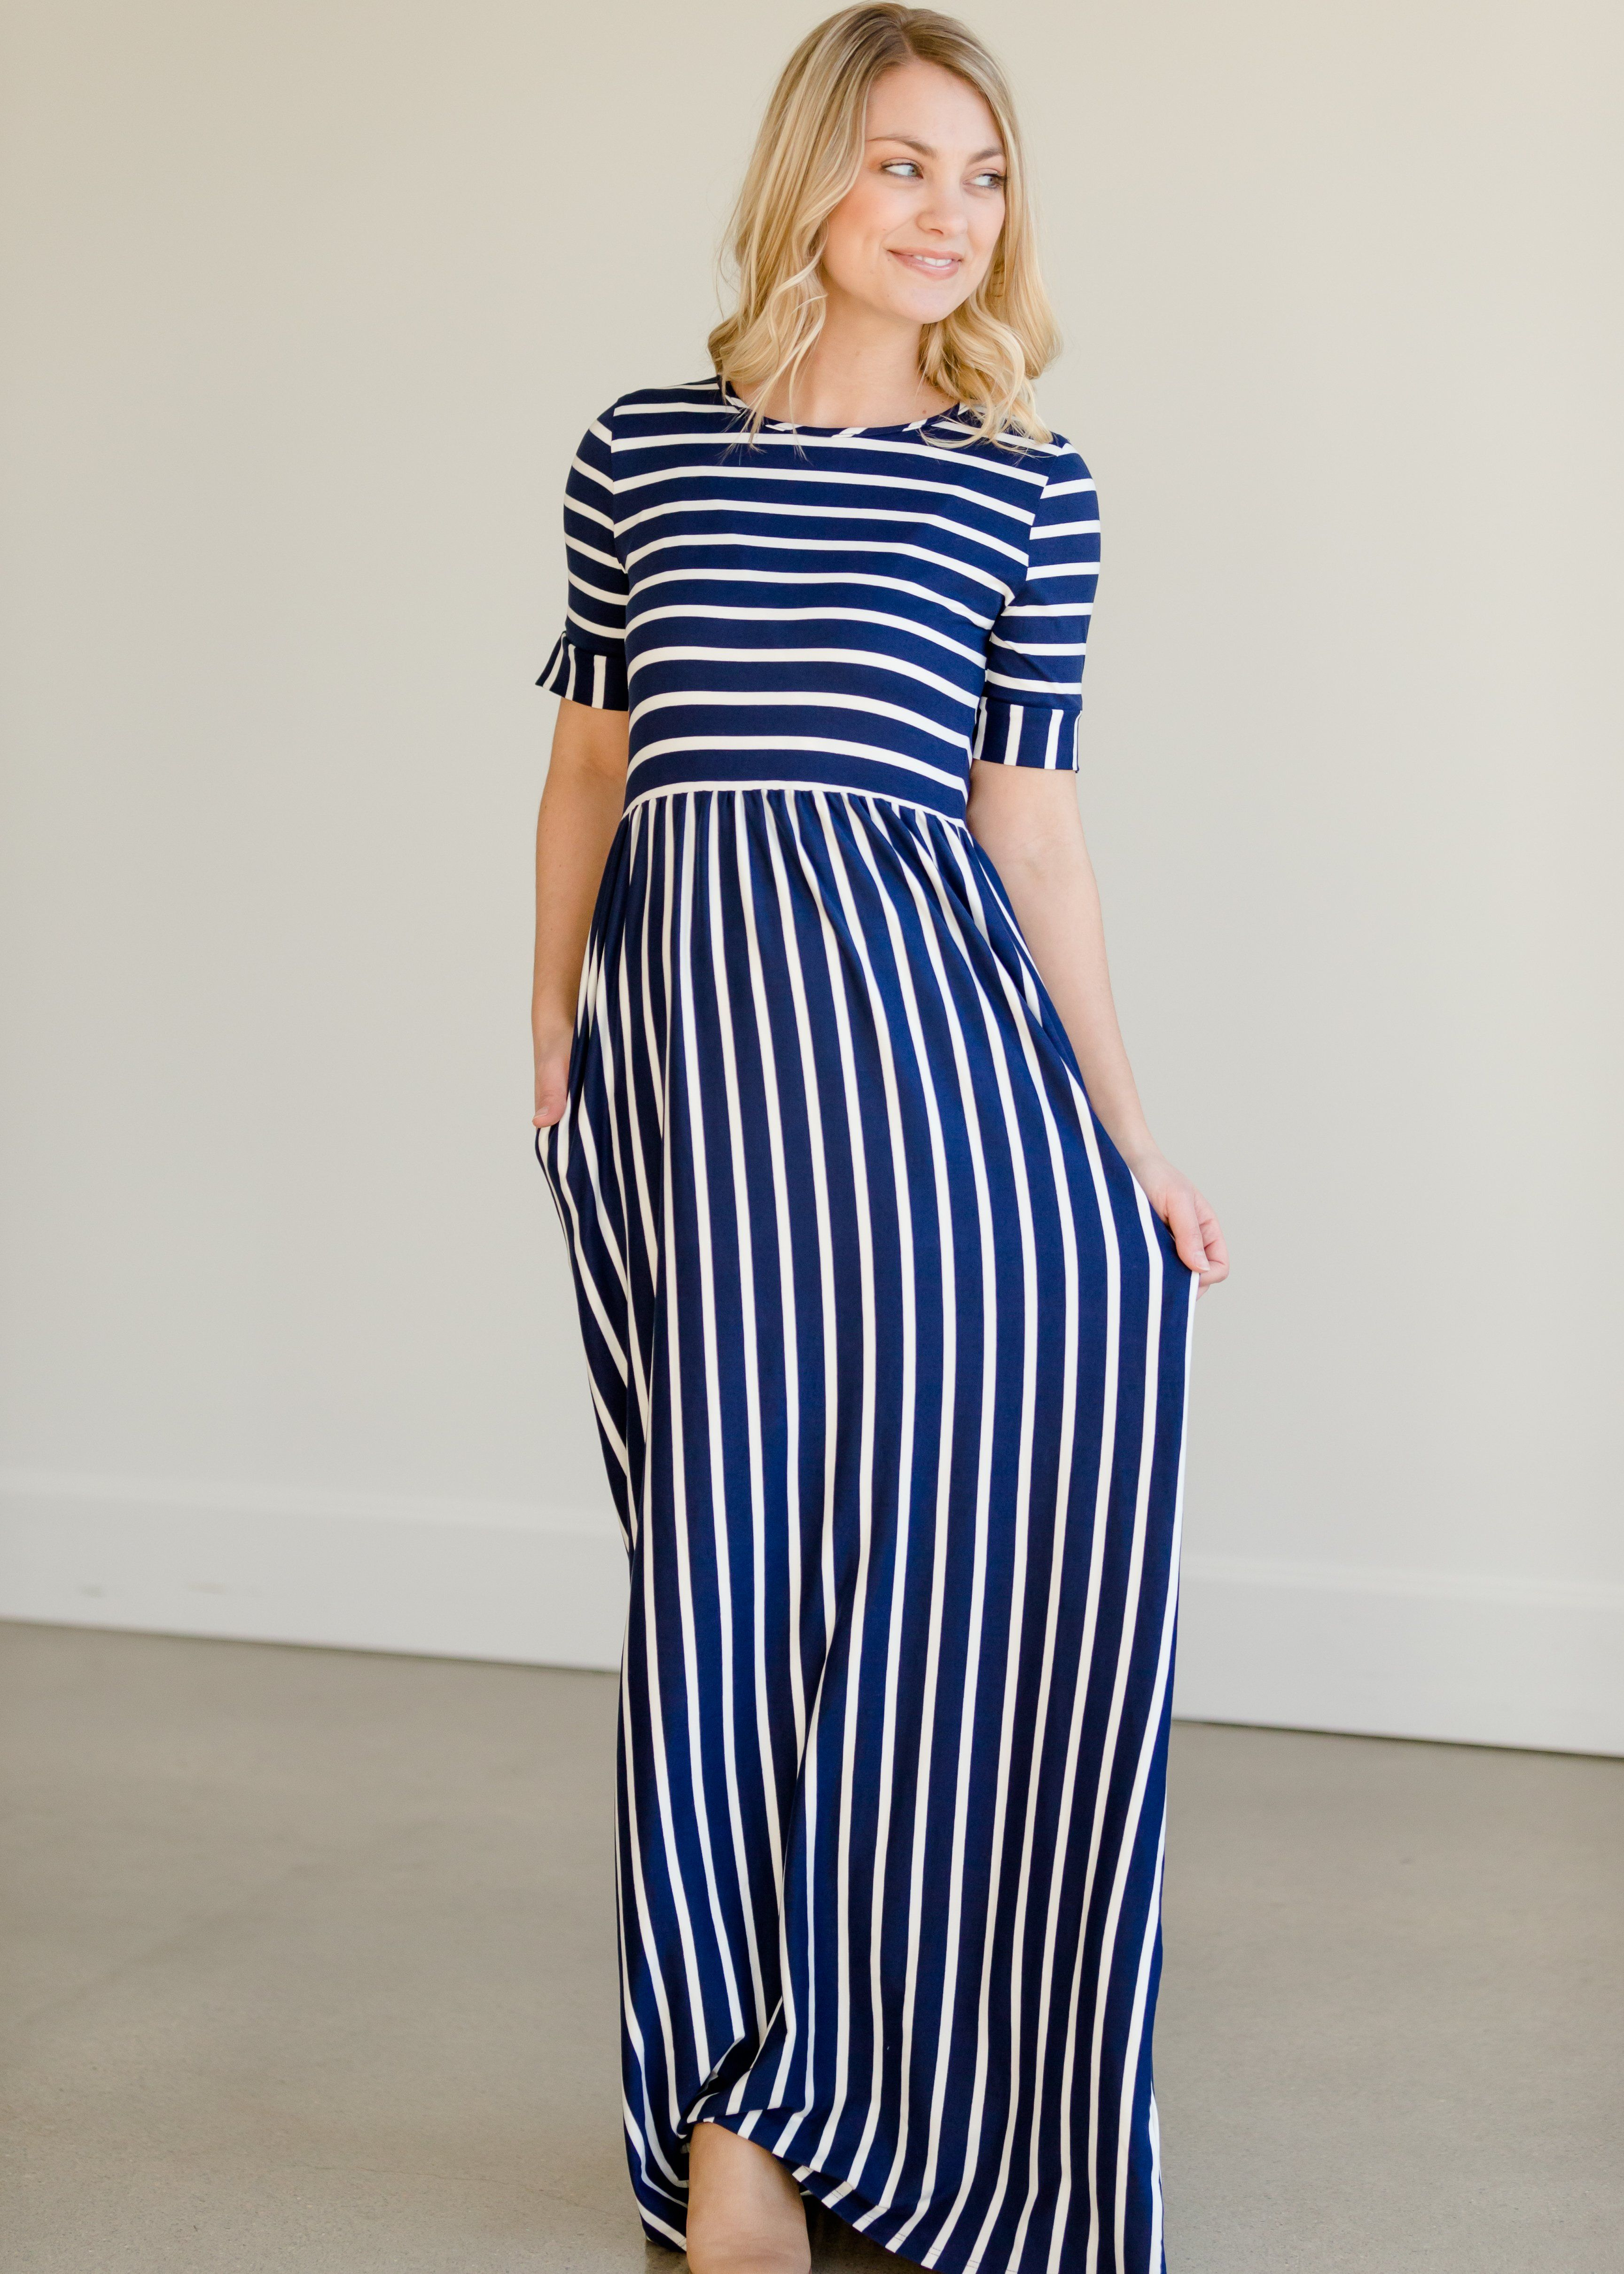 Saylor Striped Maxi Dress Maxi Dress Striped Maxi Dresses Modest Maxi Dress [ 4838 x 3456 Pixel ]